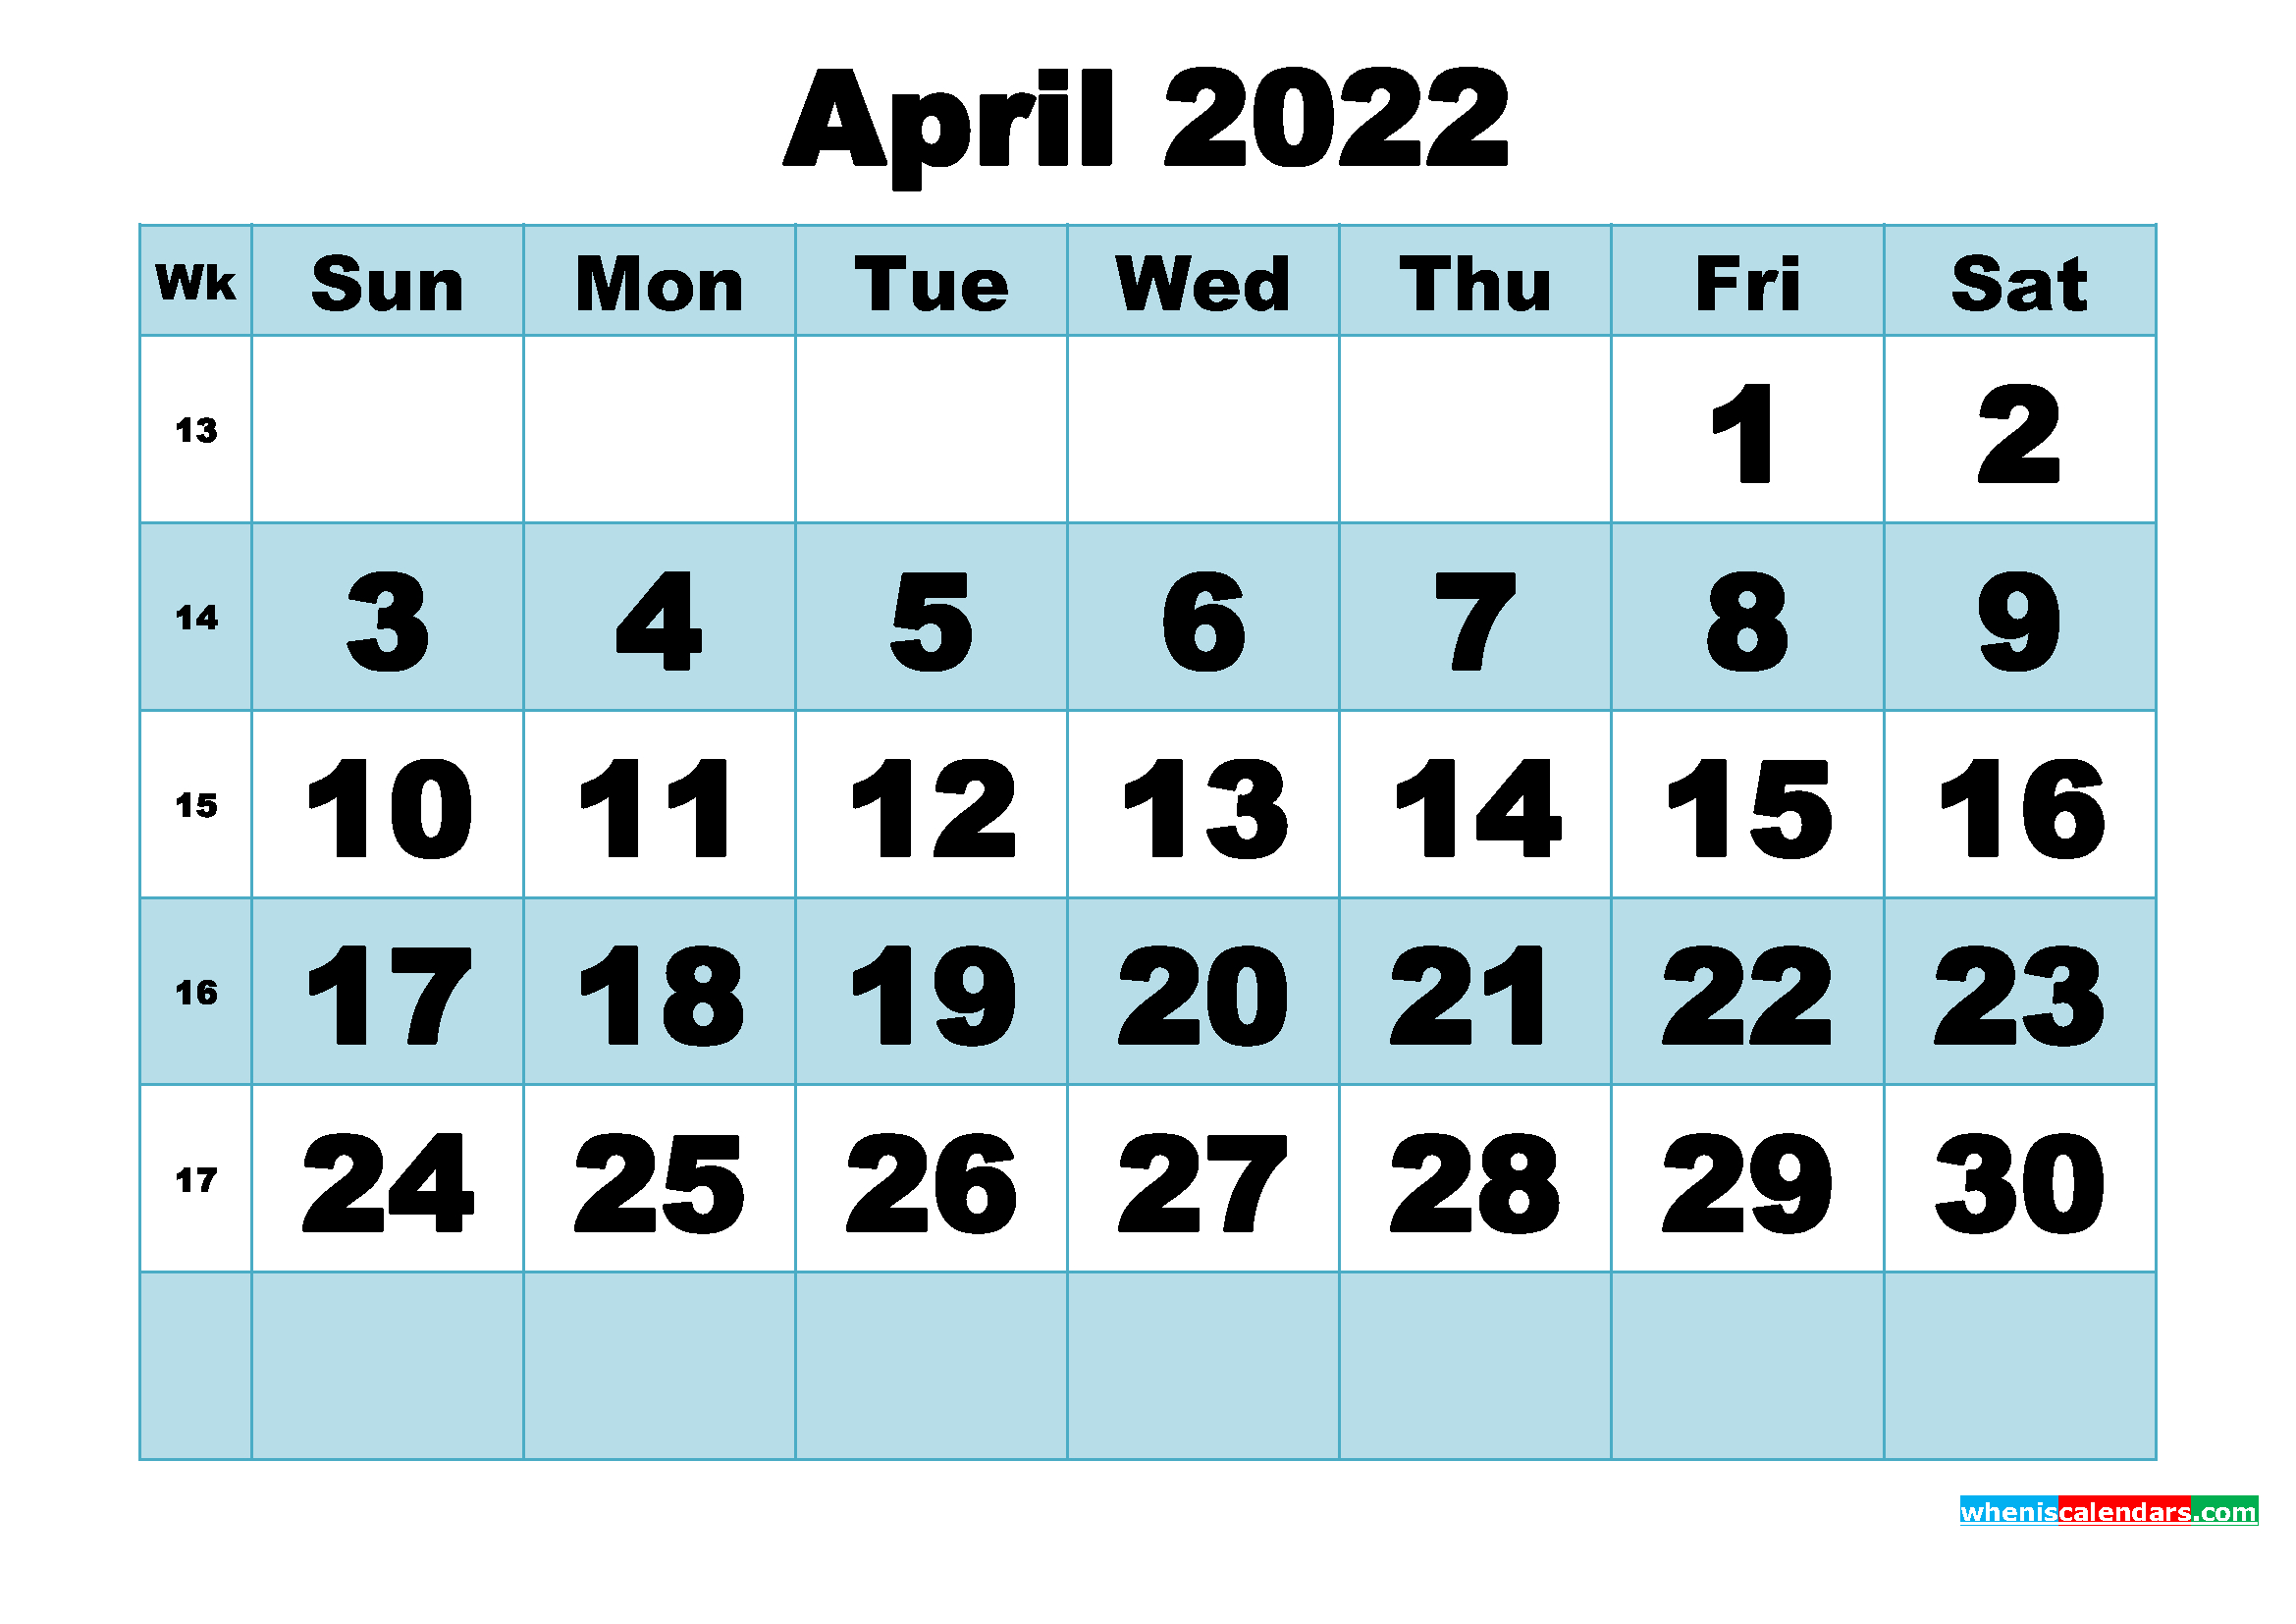 Free Printable April 2022 Calendar Word, Pdf, Image regarding April Monthly Calendar 2022 Free Printable Photo